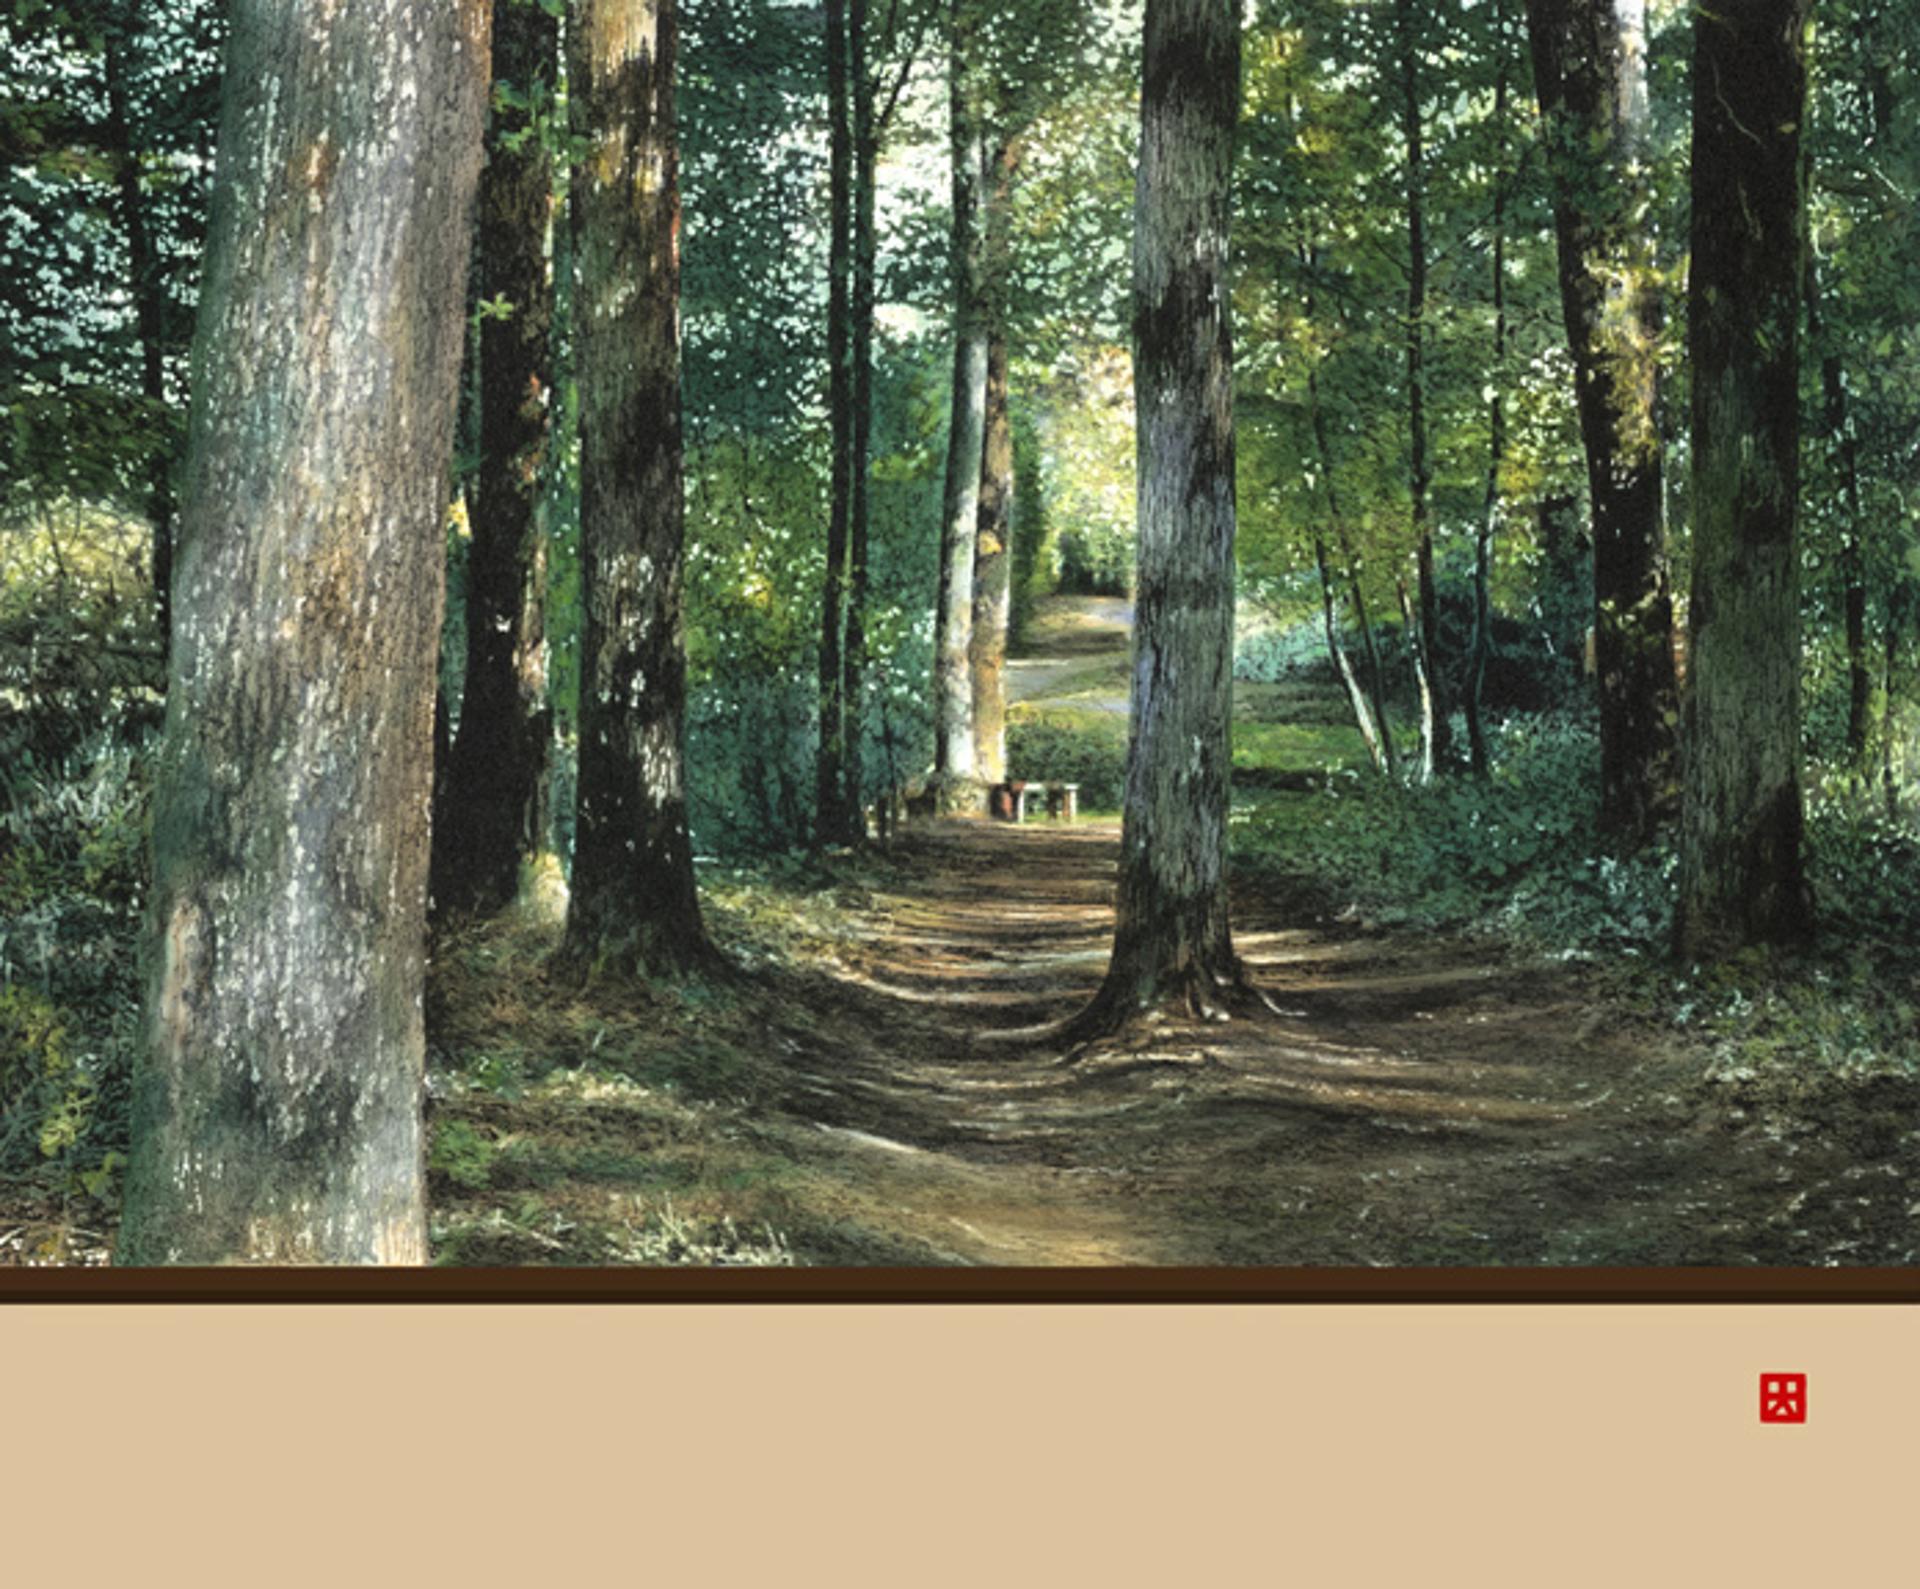 A Leisurely Walk in Mayenne by Hisashi Otsuka